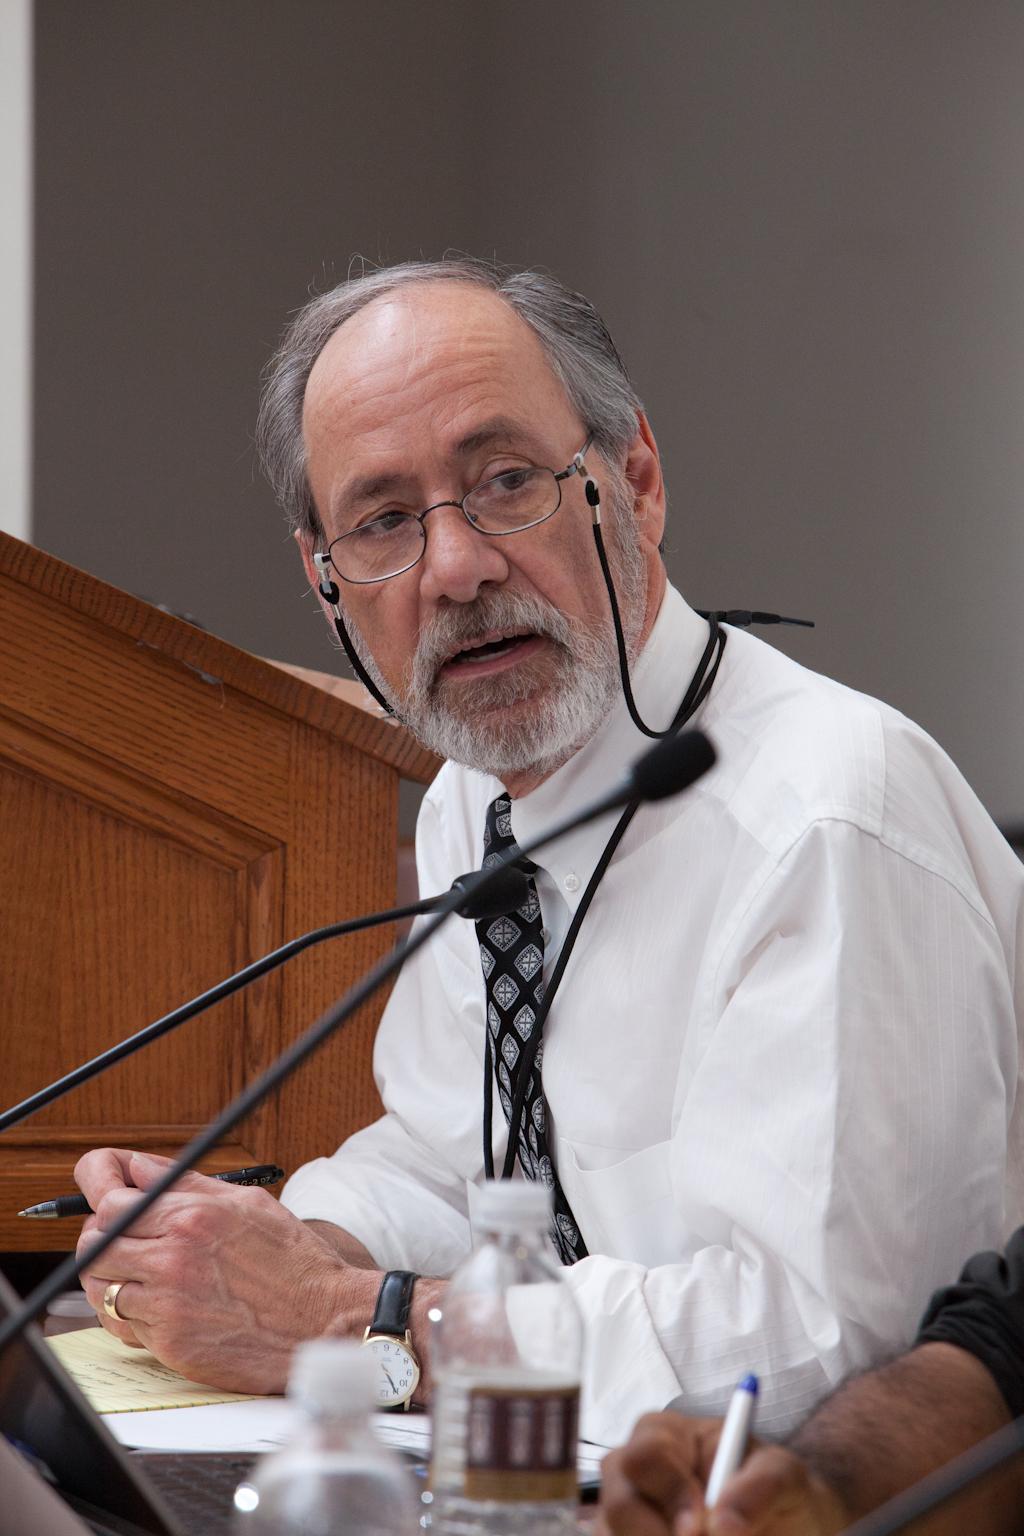 Duke Law and Business School Prof. Michael Bradley